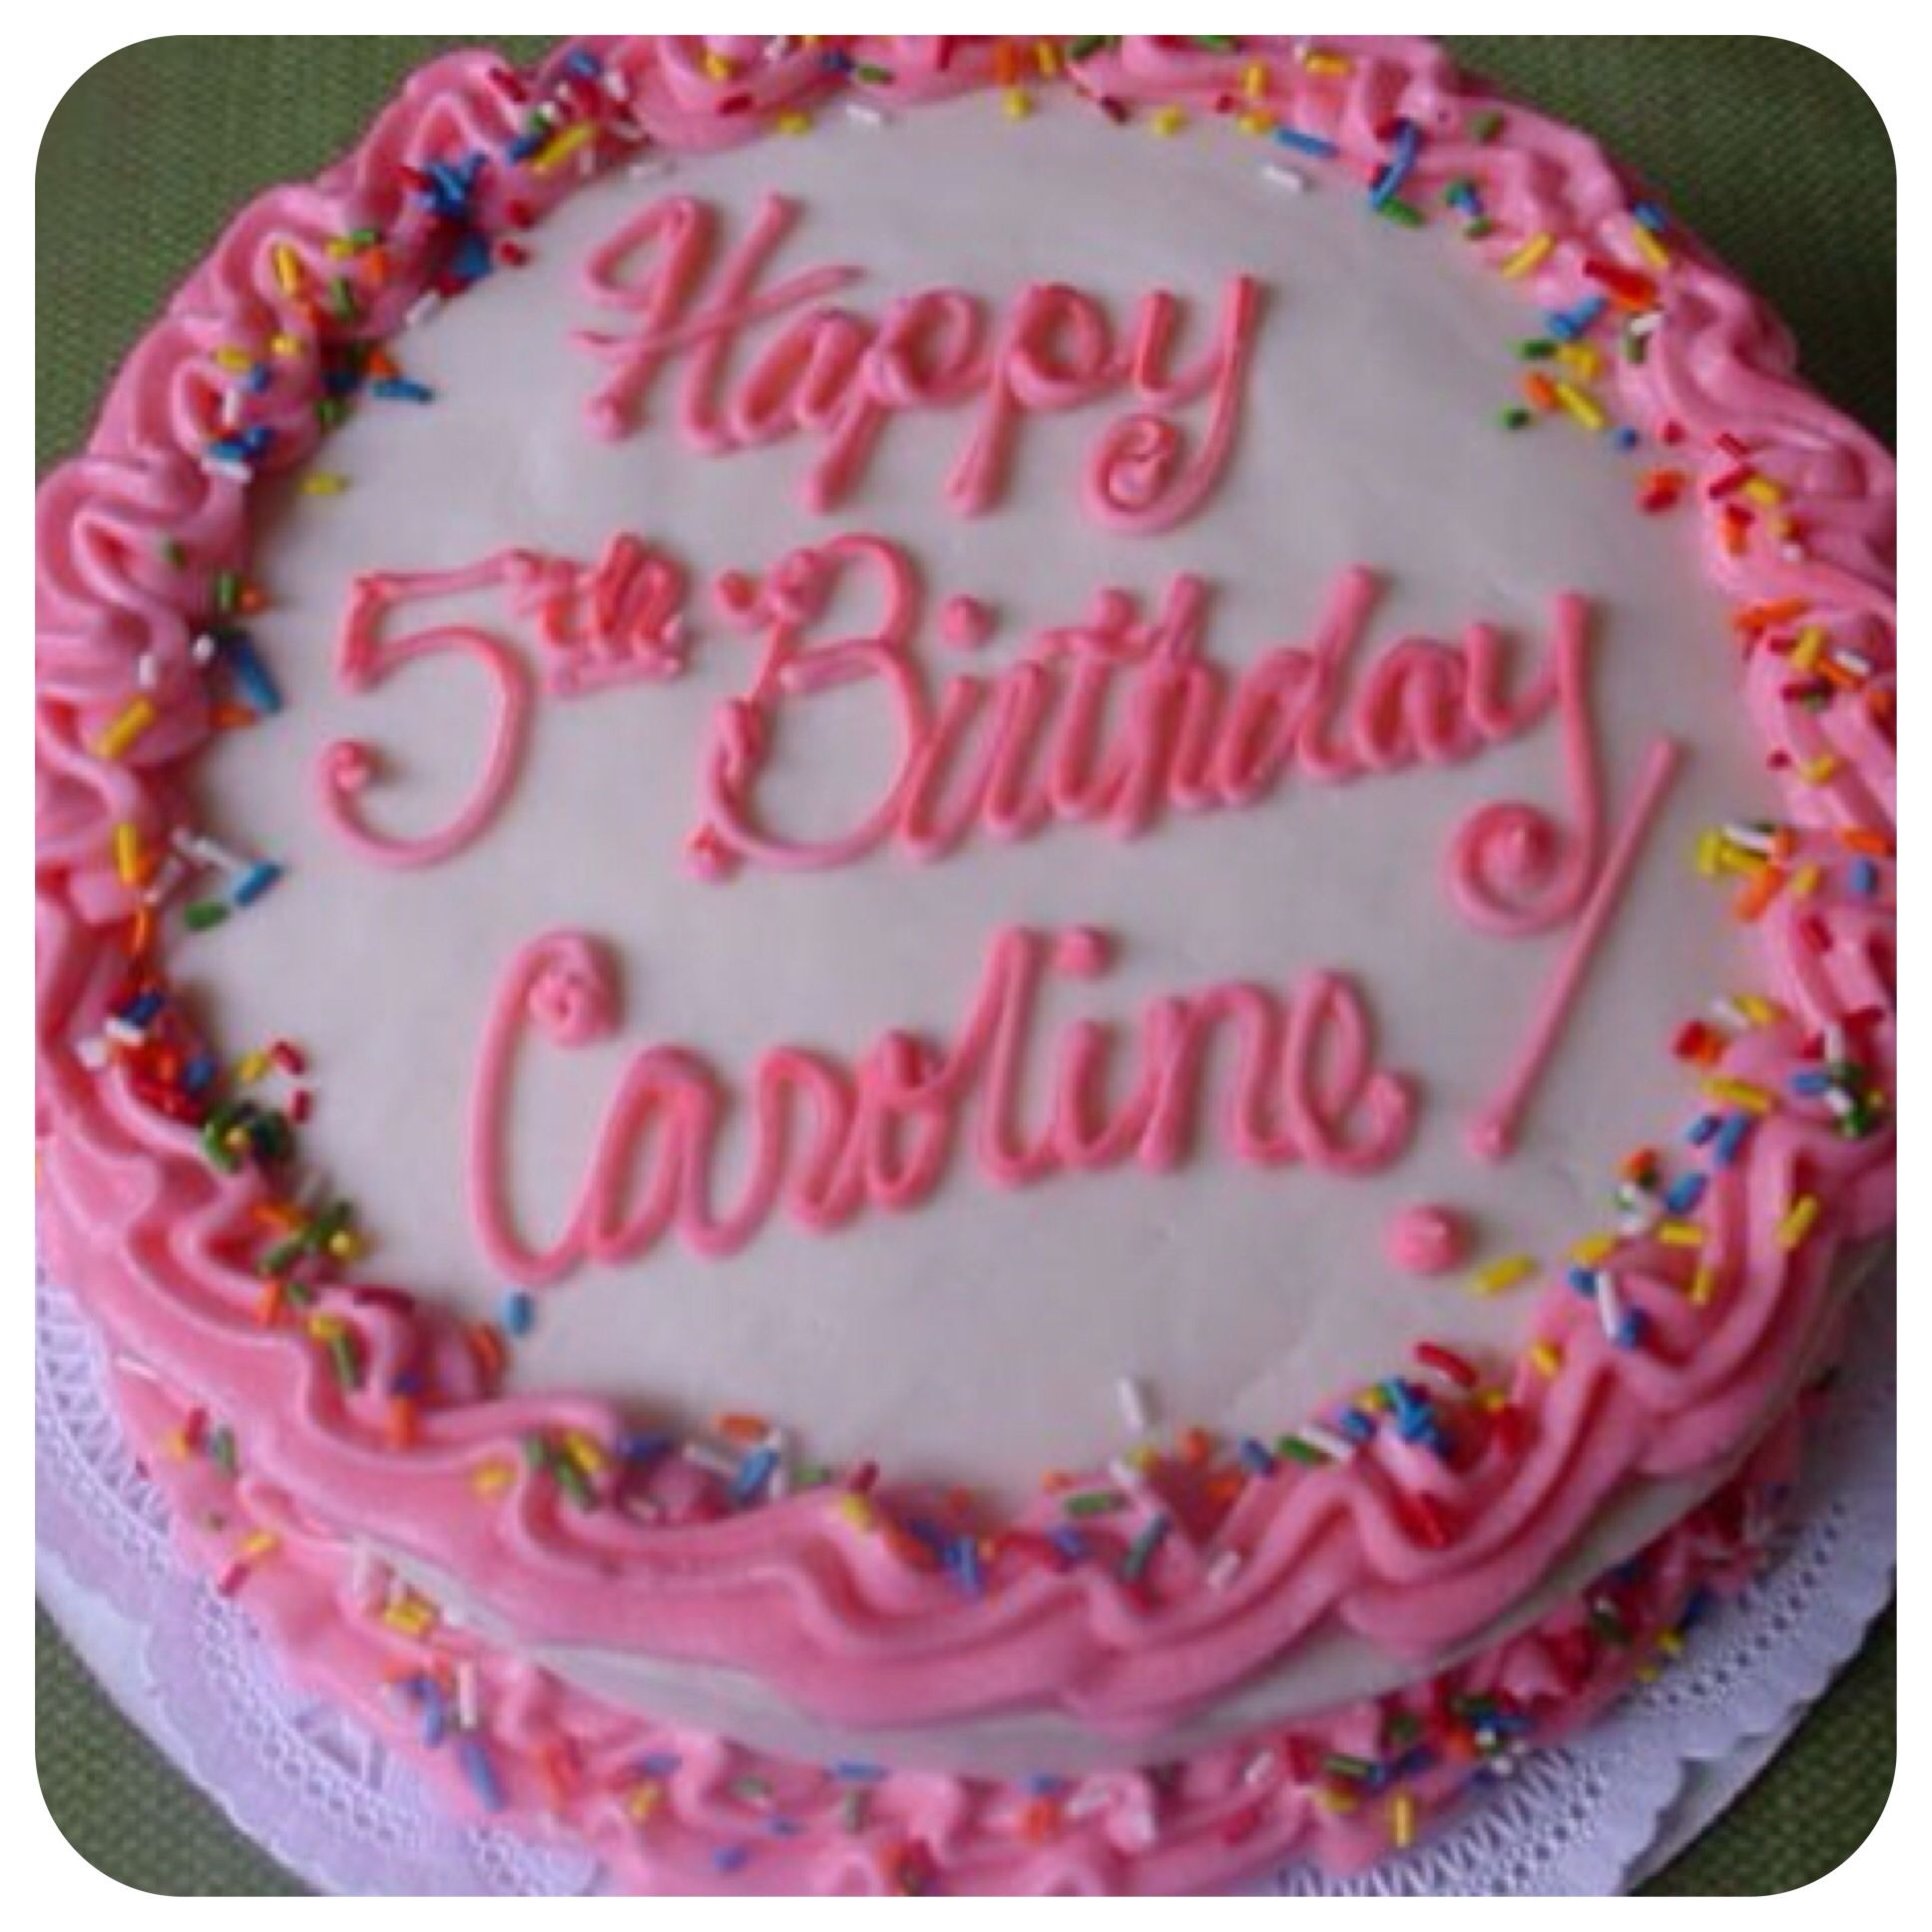 Happy Birthday Caroline (With Images)